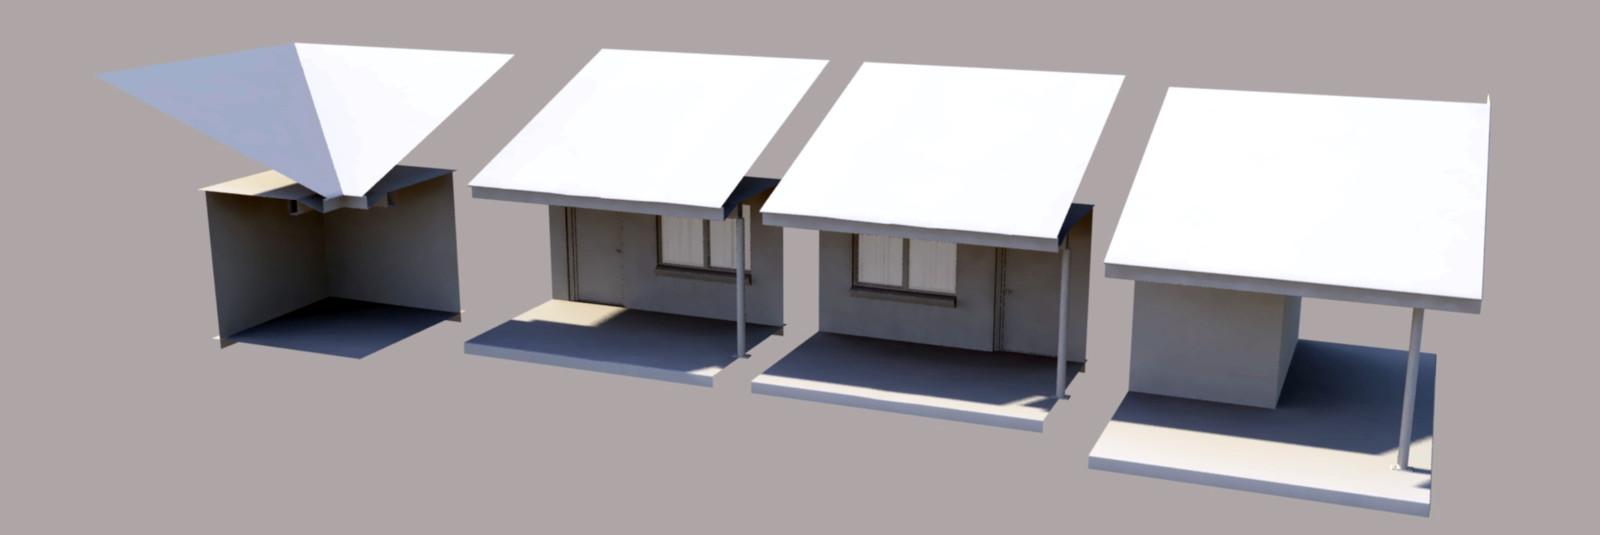 Modular Motel Pieces